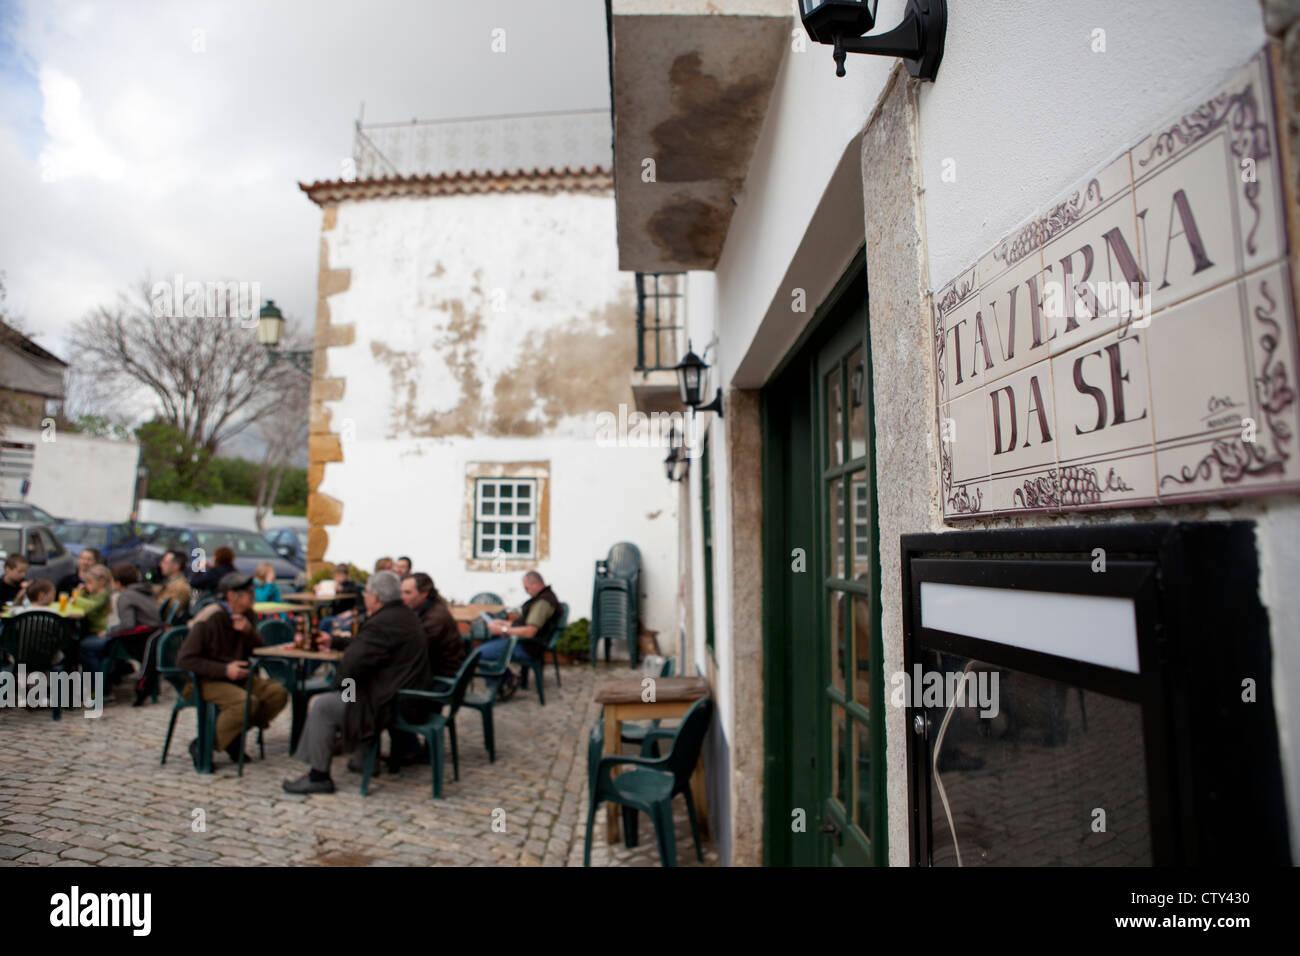 Taverna Da Se pub bar Faro Algarve Portugal Stock Photo